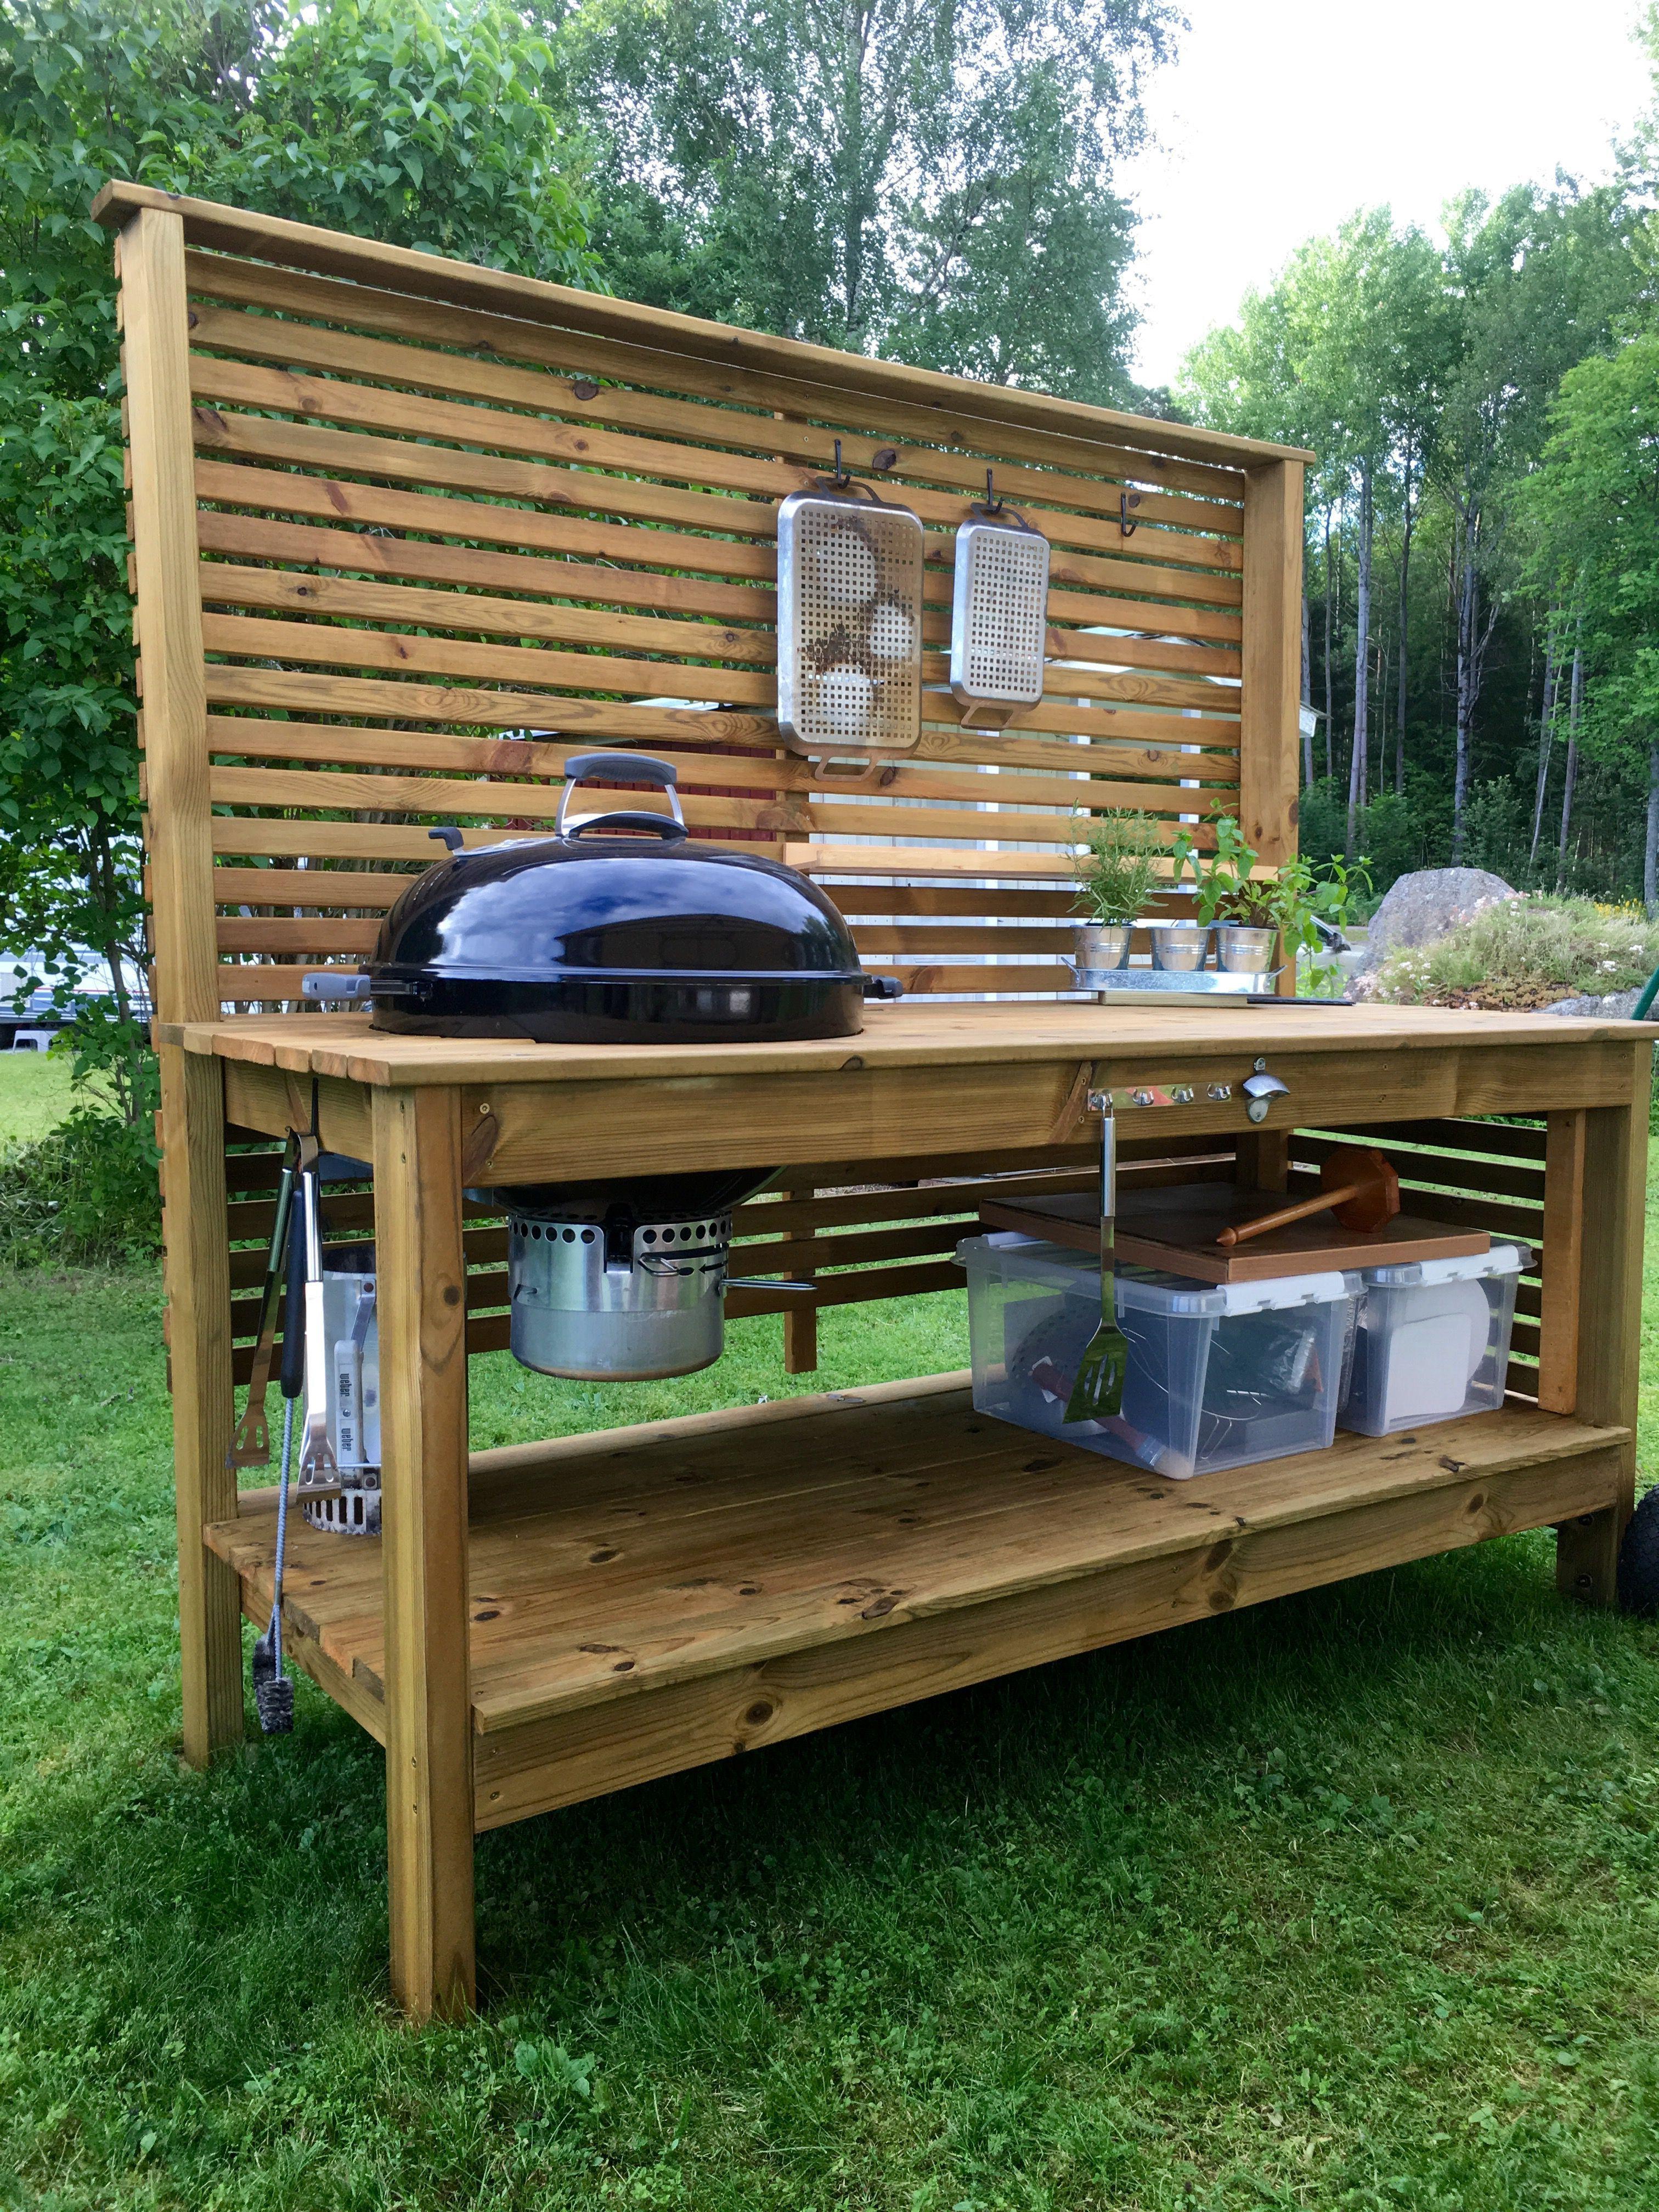 diy backyard patio ideas outdoor grill station big green egg outdoor kitchen diy outdoor kitchen on outdoor kitchen diy id=67817